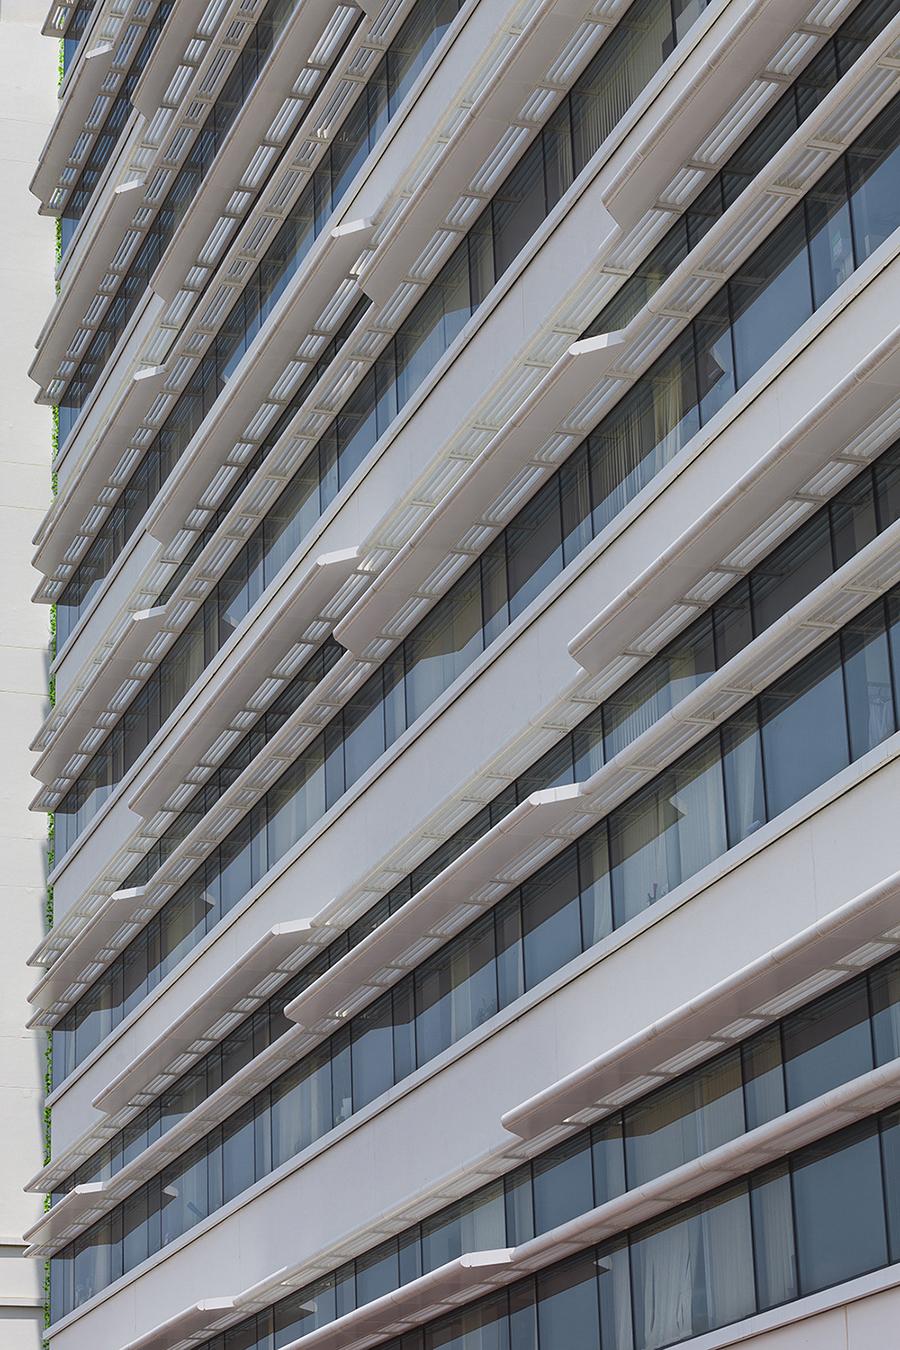 LO KWEE-SEONG INTEGRATED BIOMEDICAL SCIENCES BUILDING